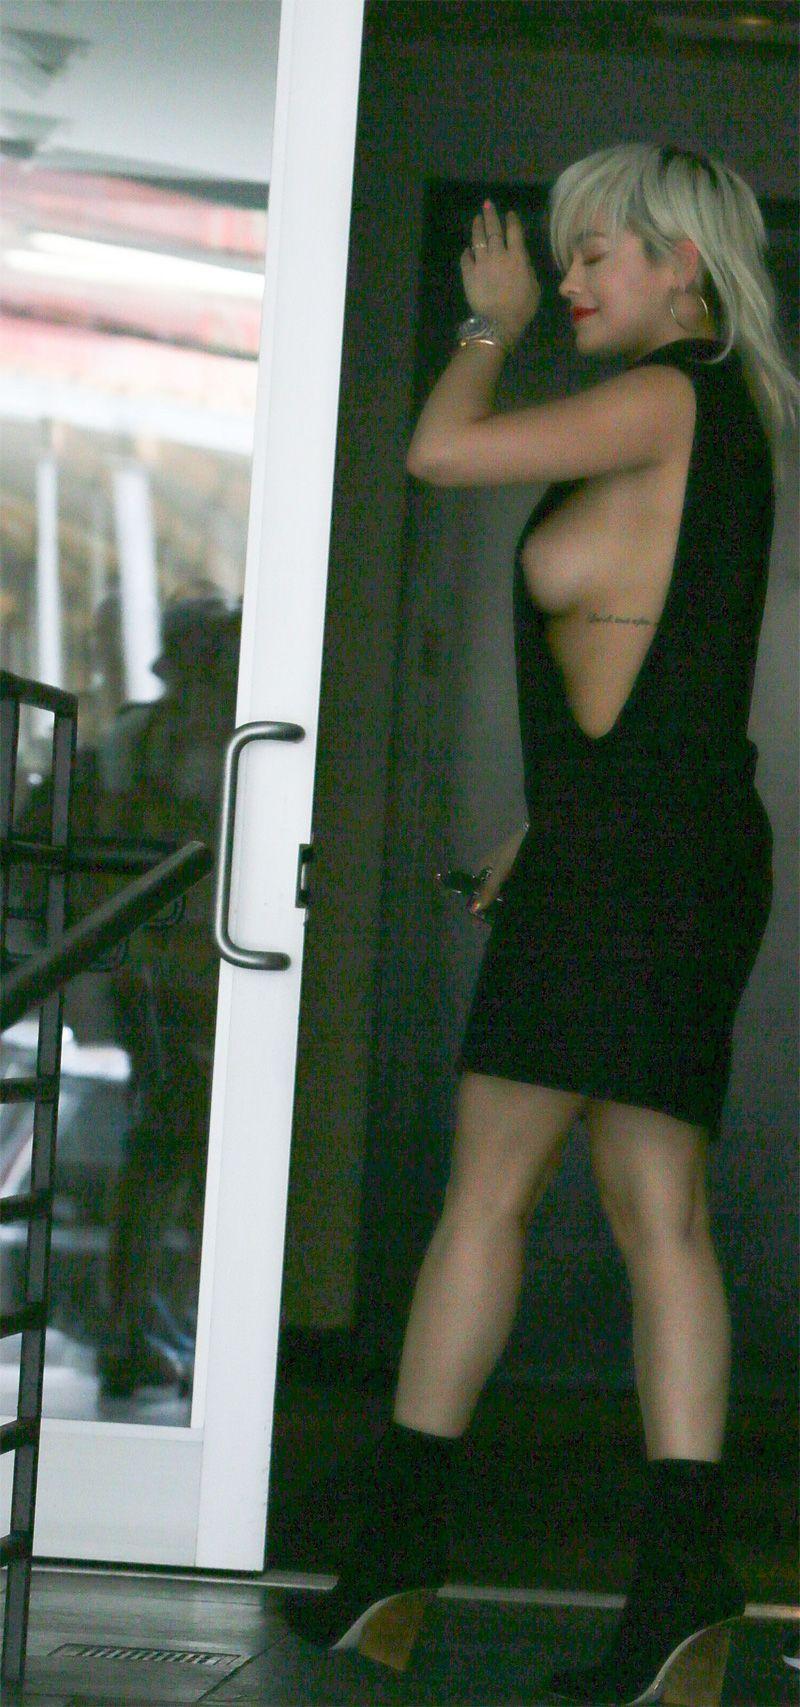 Rita Ora Sideboob (3 Photos)